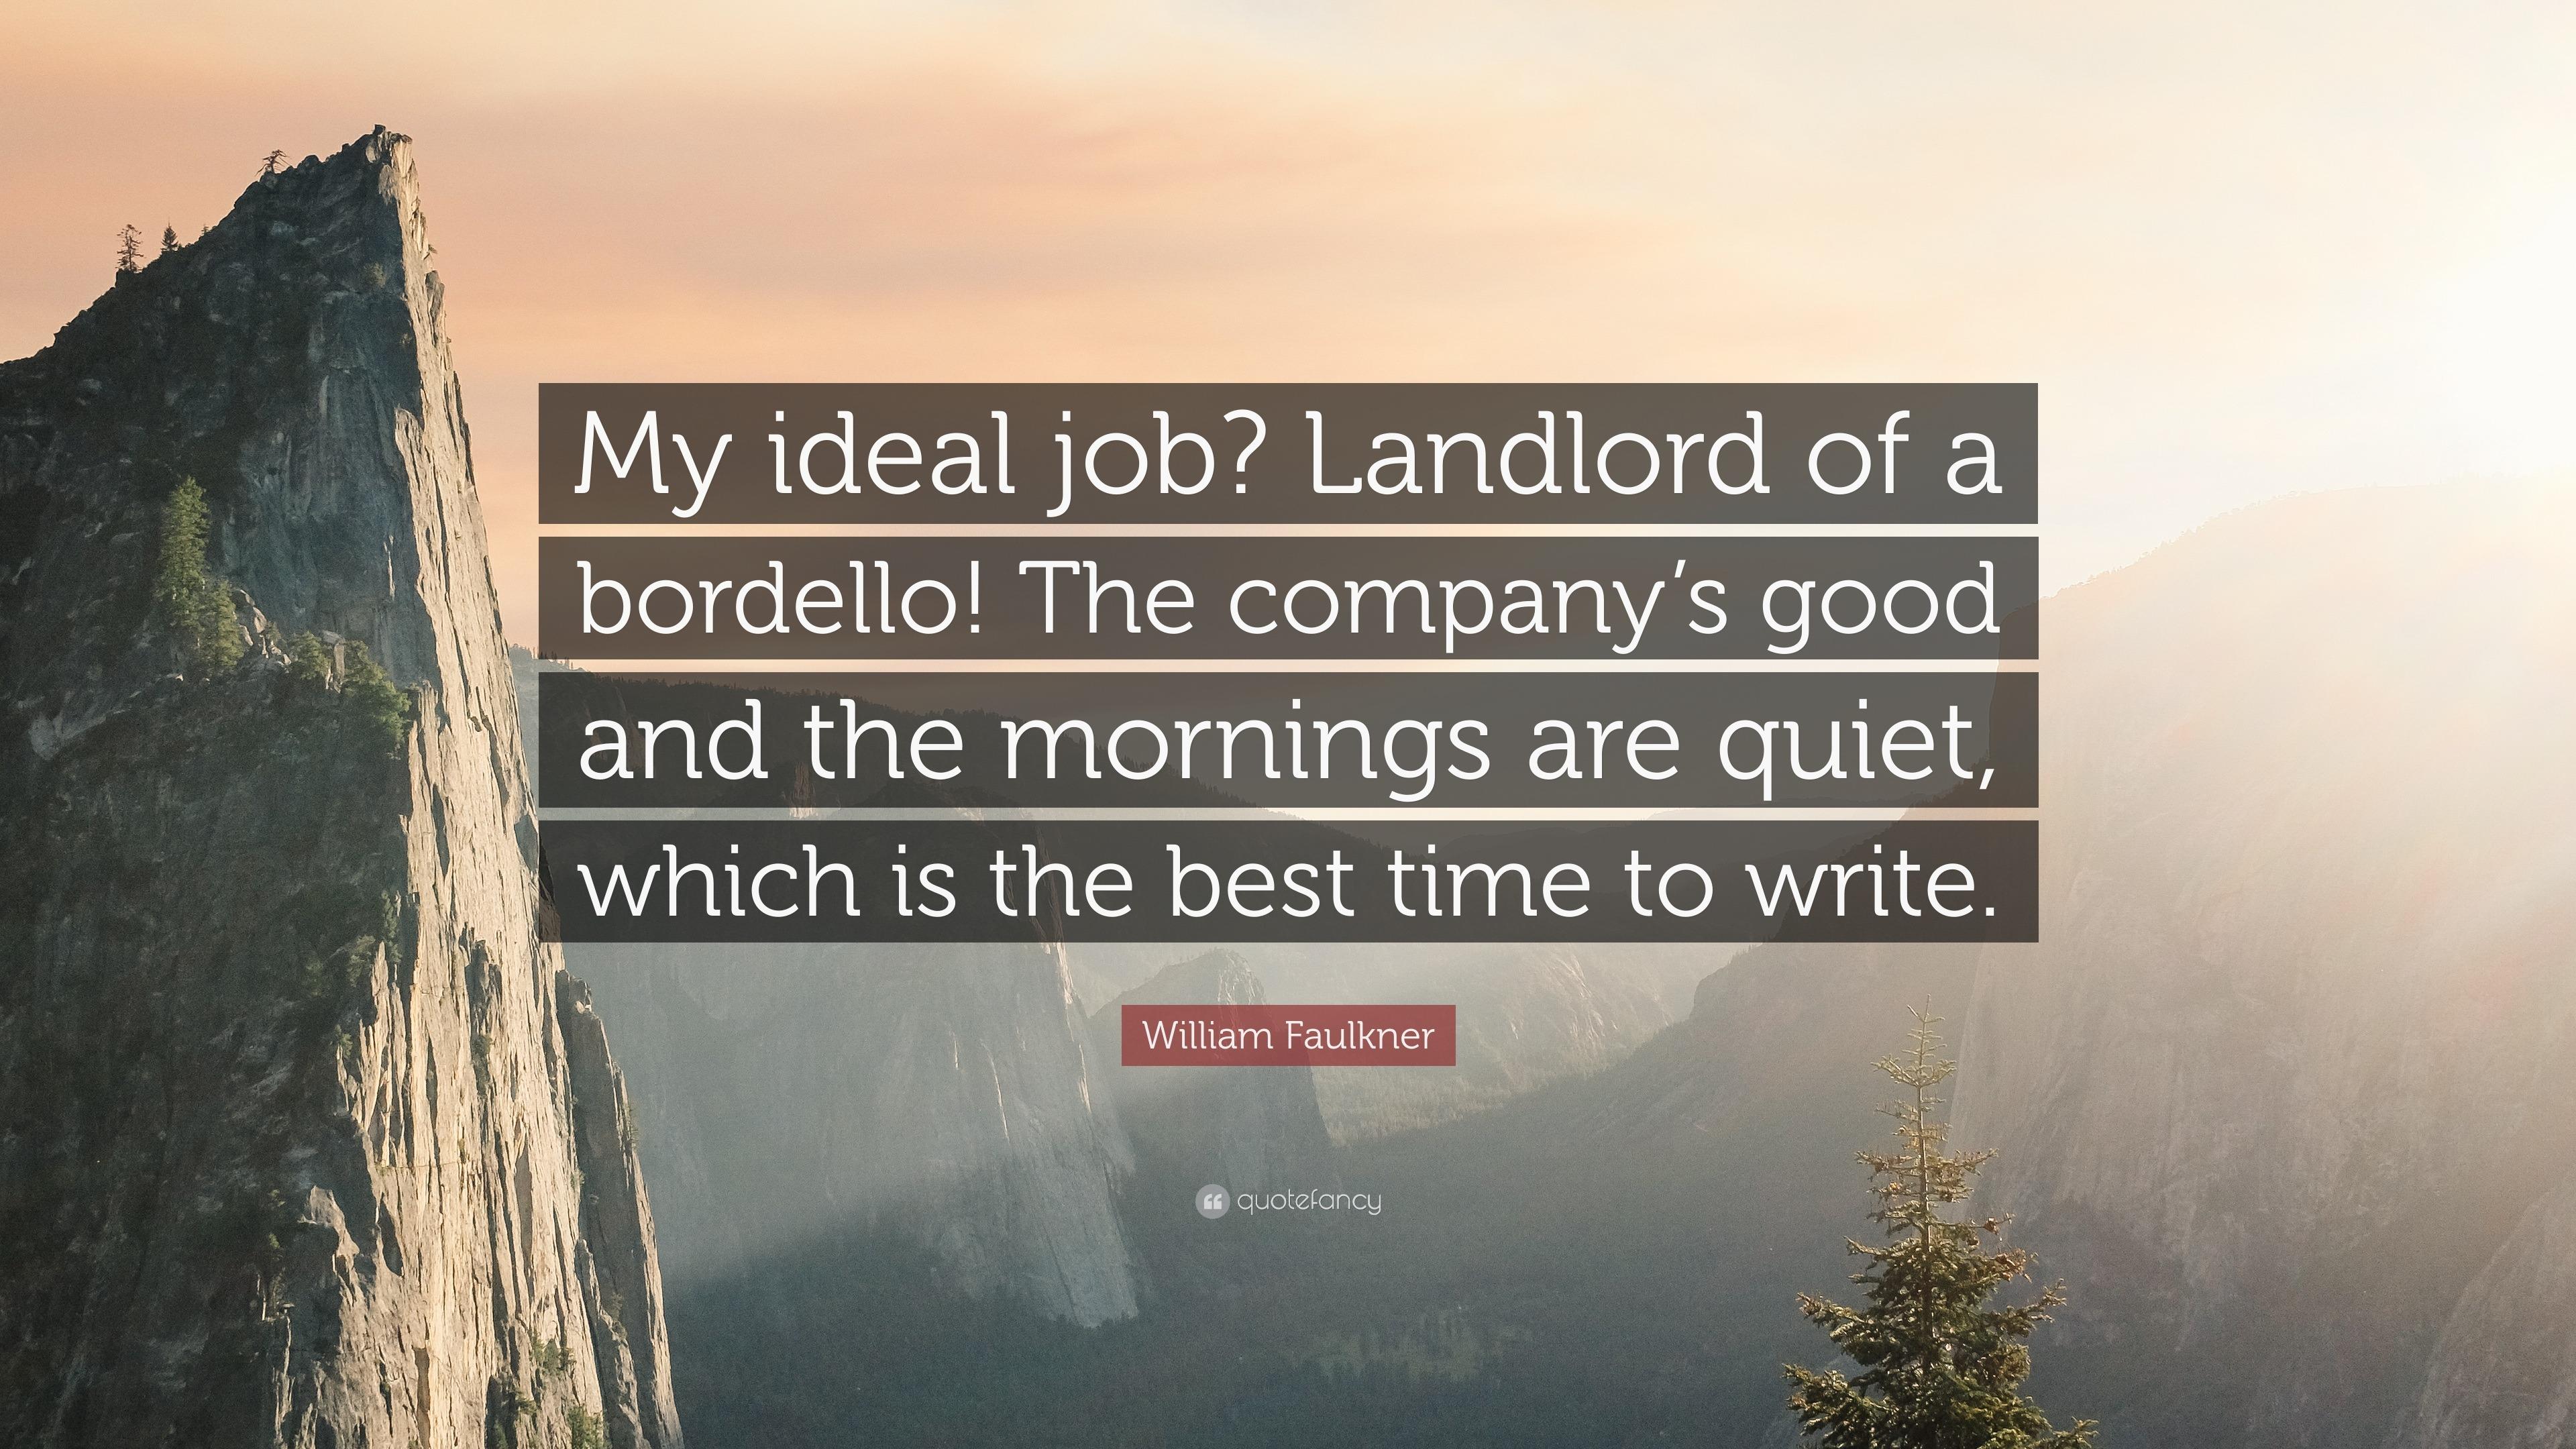 william faulkner quote   u201cmy ideal job  landlord of a